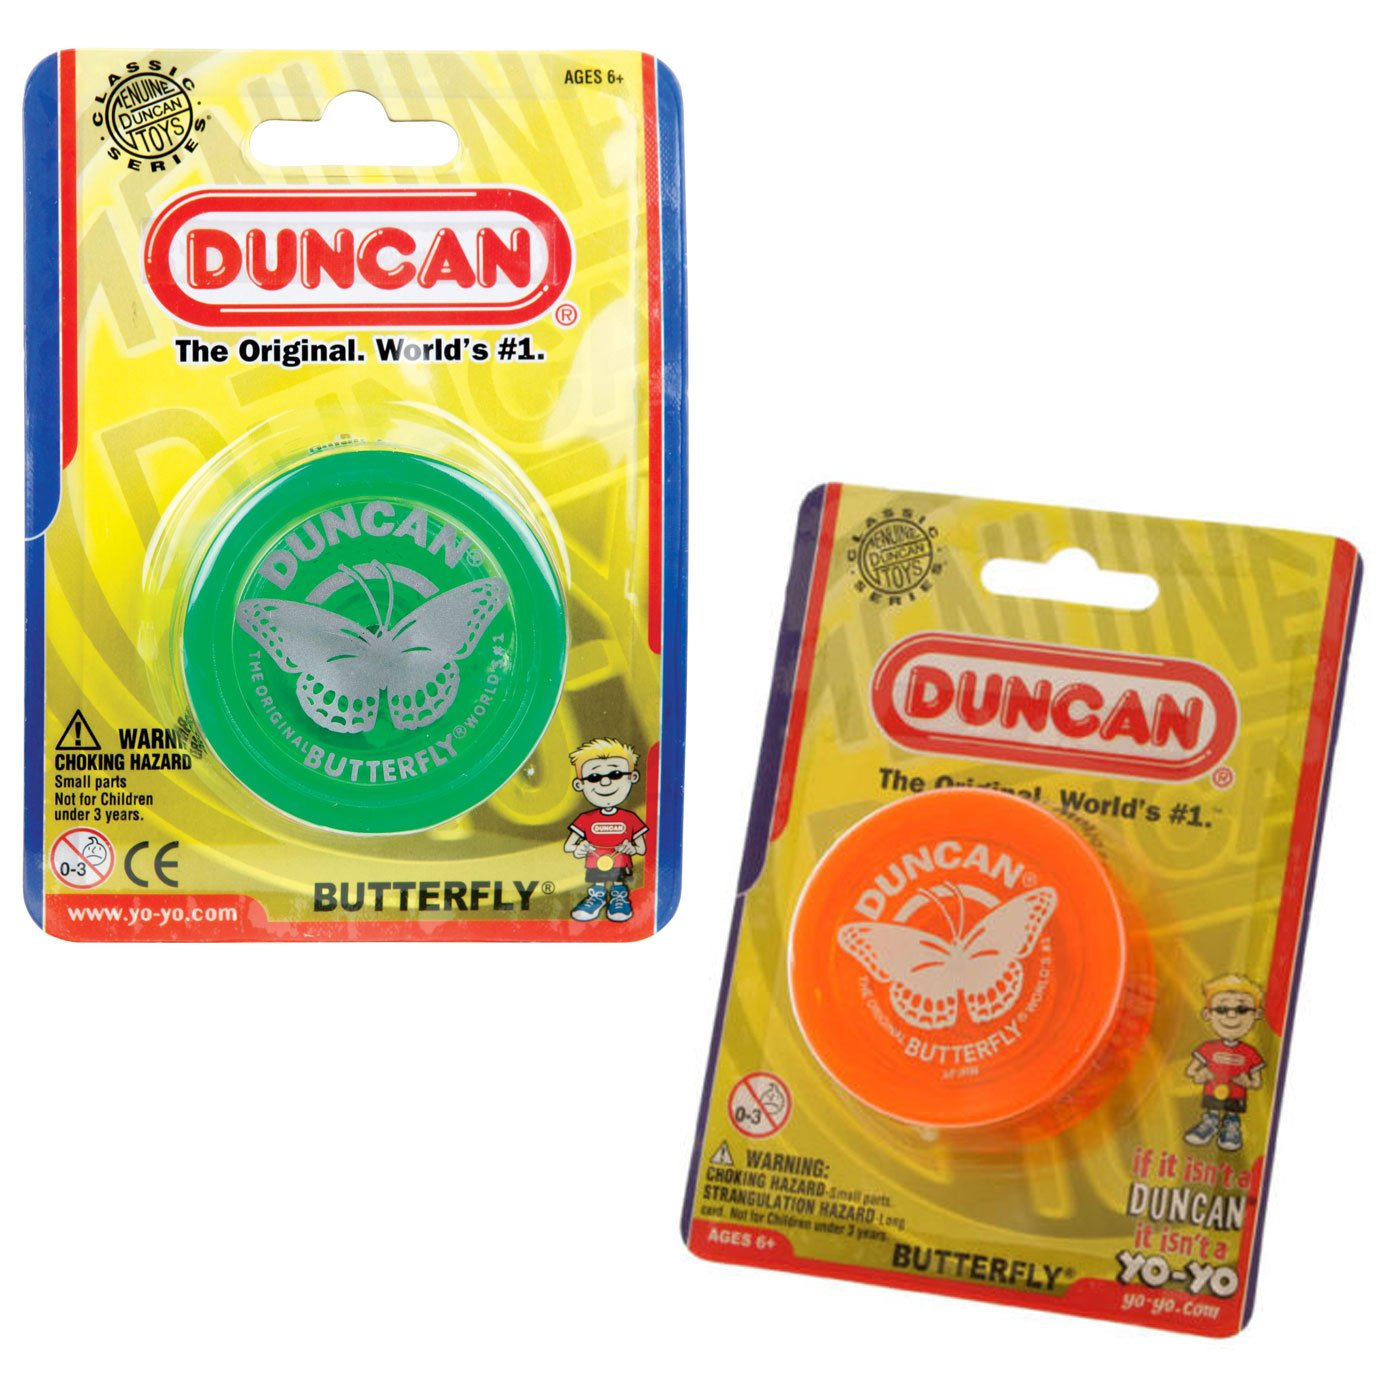 Duncan Butterfly Yo-Yo Orange and Green Two pack